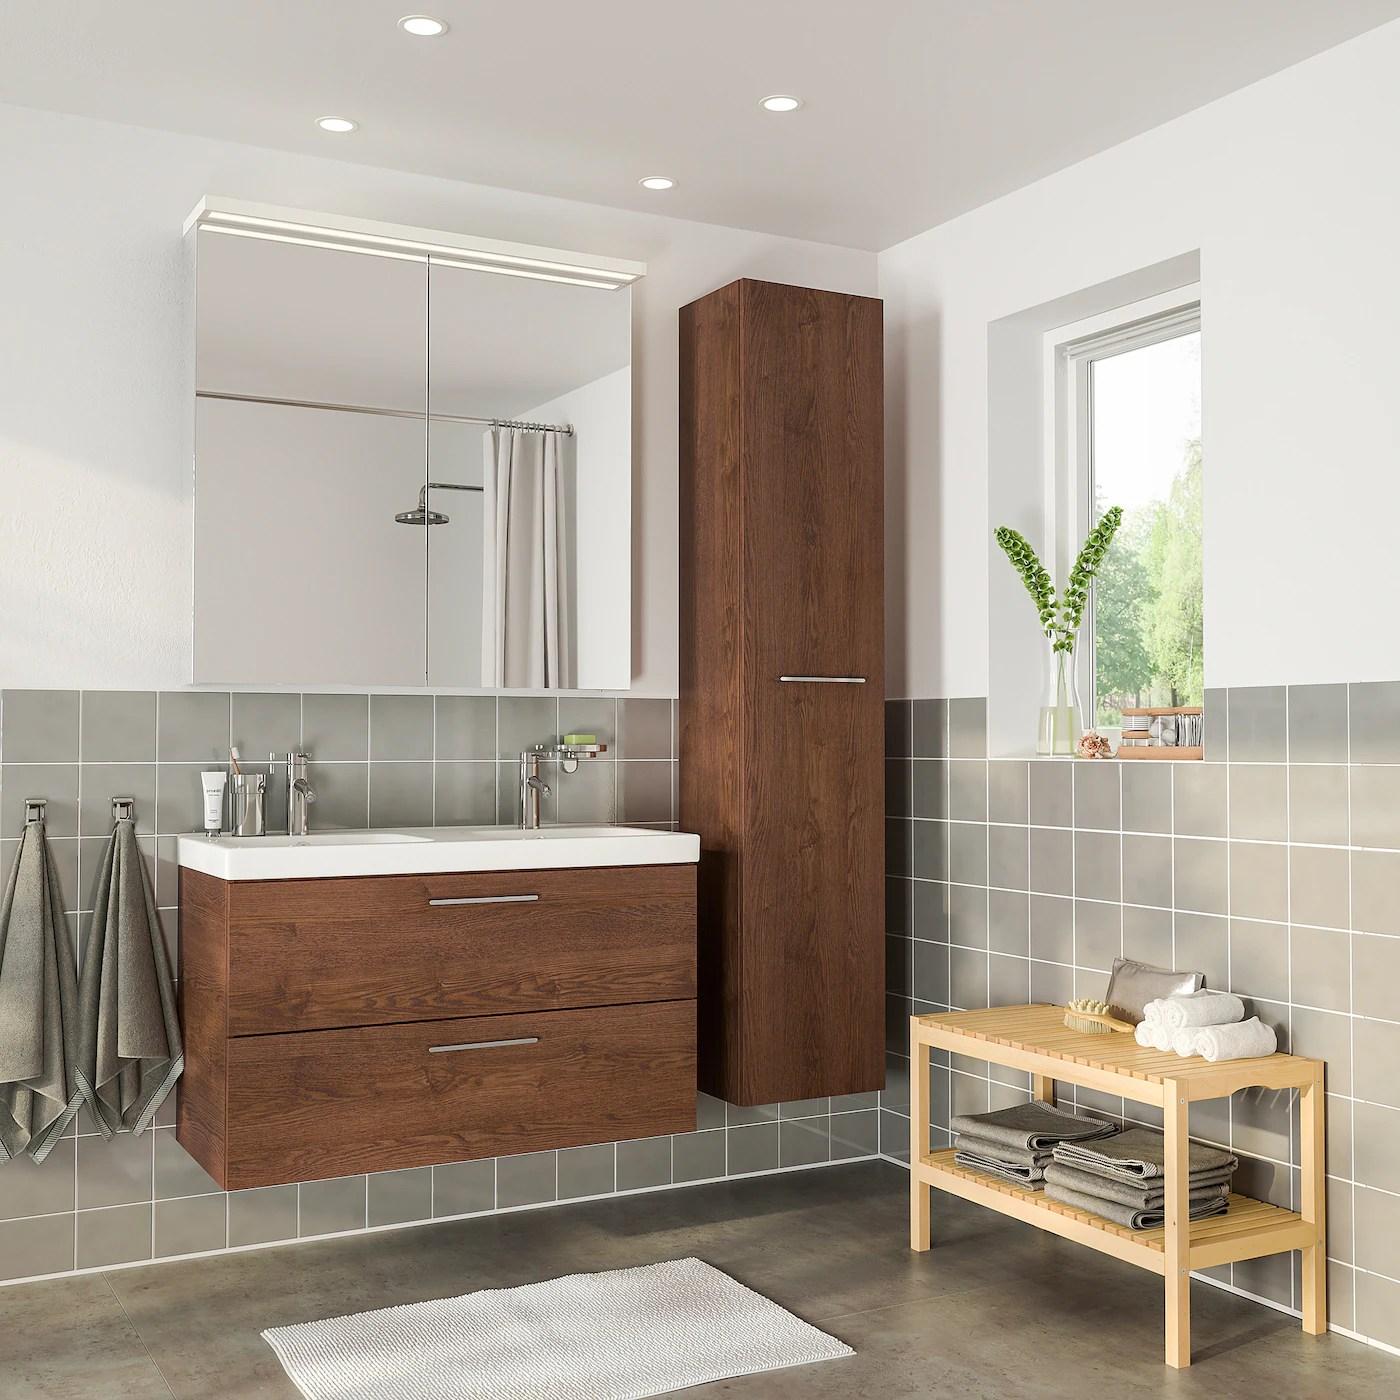 godmorgon odensvik mobilier salle de bains 6 pieces effet frene teinte brun mitigeur lavabo dalskar 40 1 2x19 1 4x25 1 4 103x49x64 cm